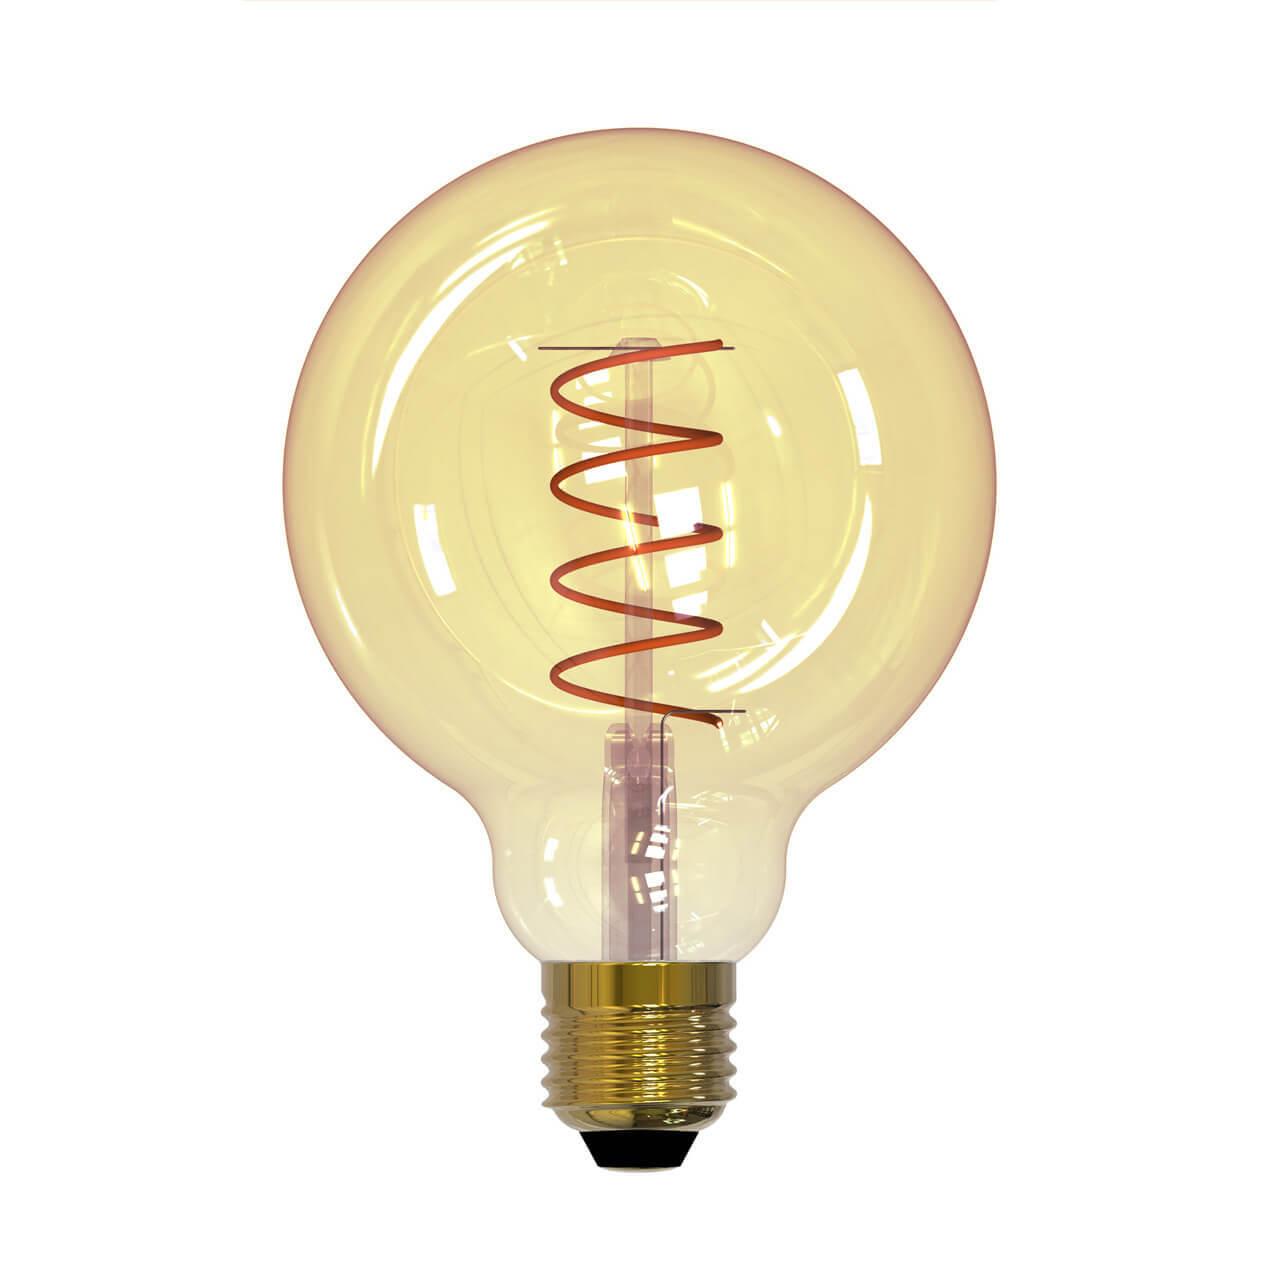 Лампа светодиодная (UL-00001818) E27 4W 2250K прозрачная LED-G95-4W/GOLDEN/E27/CW GLV21GO